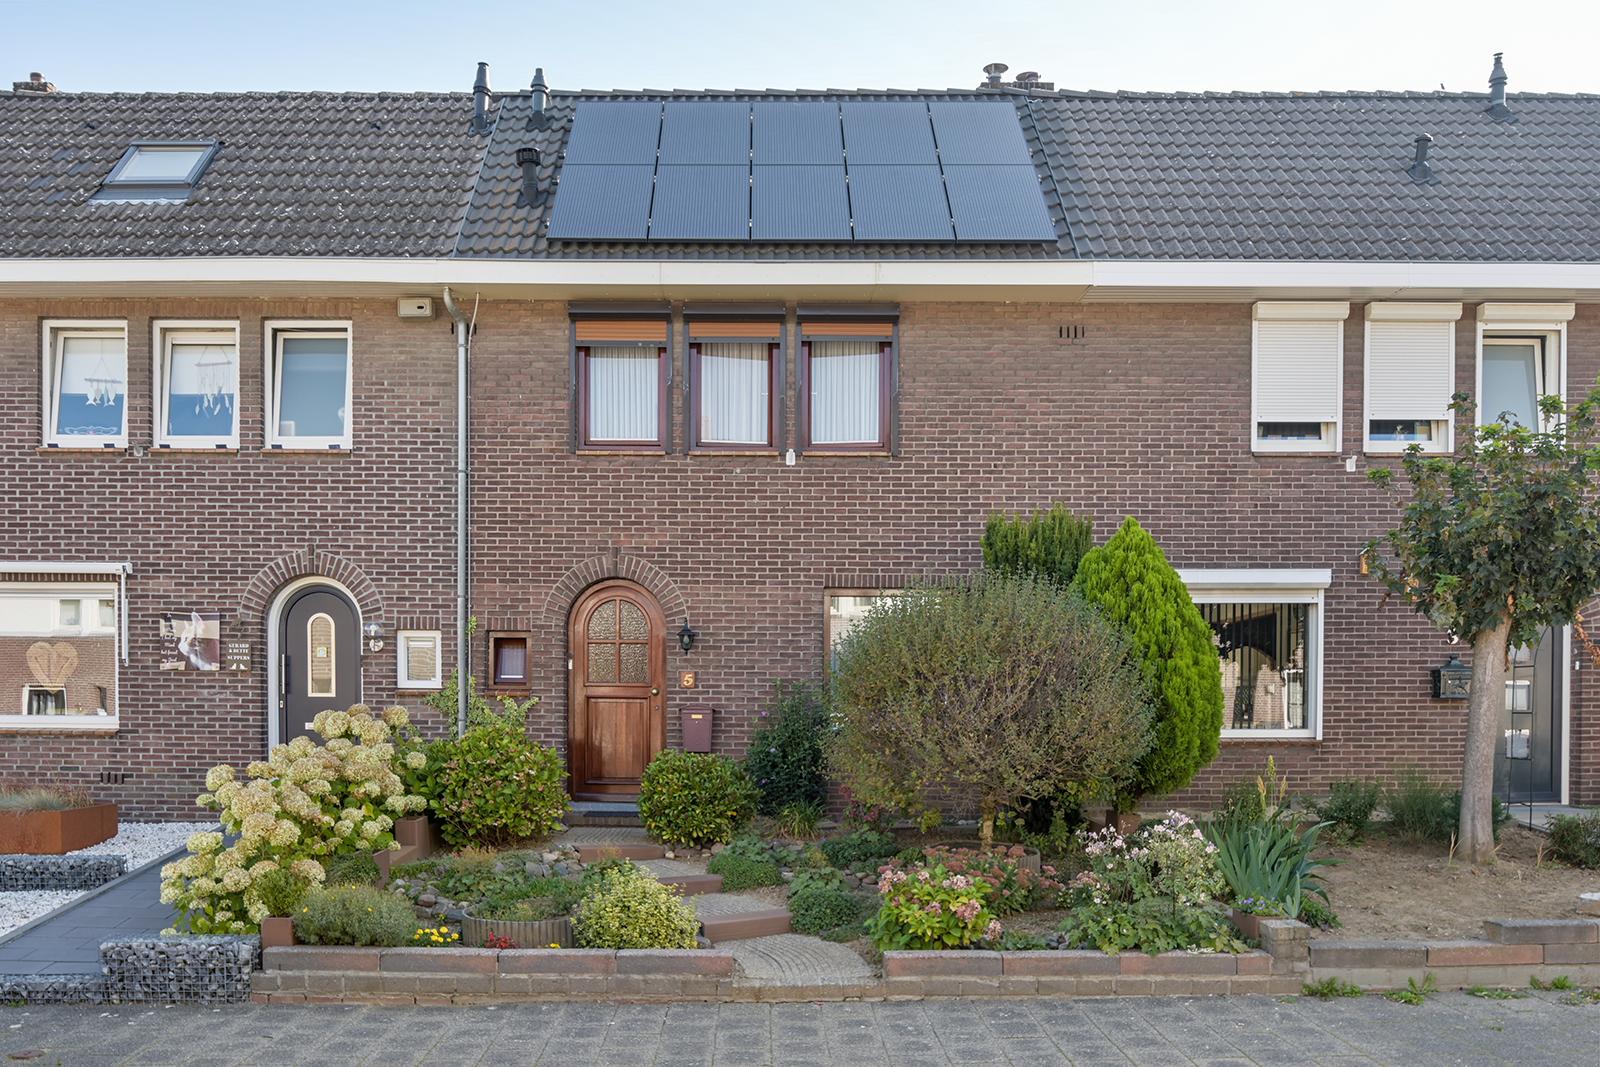 House for sale Akkerstraat 5 Sittard